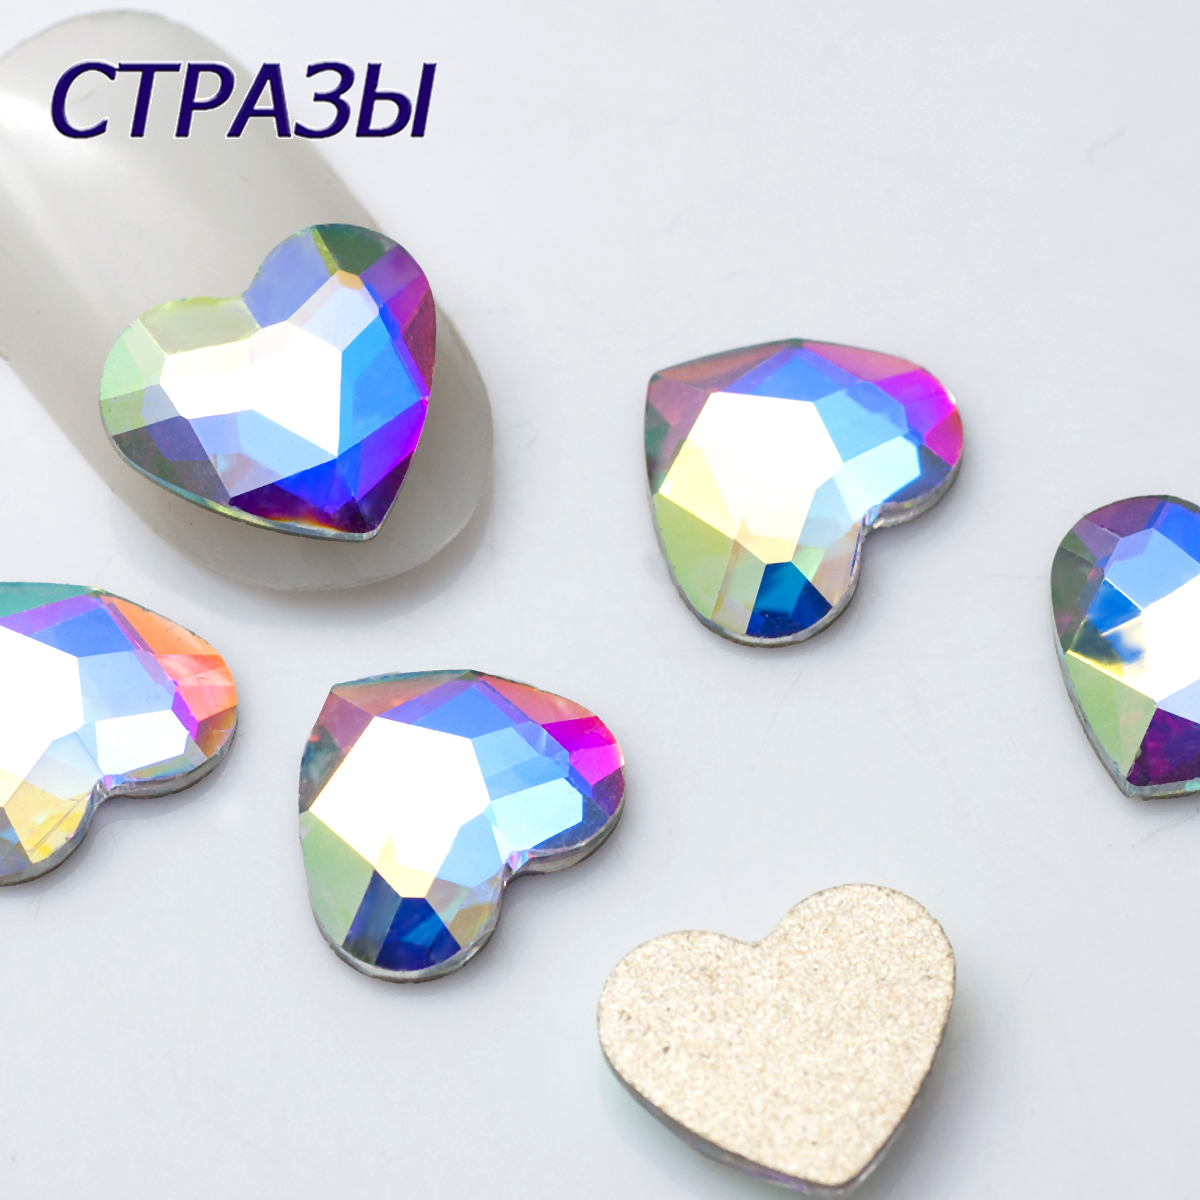 TOP Quality Strass Korean Fashion 3D Nail Art Rhinestone Heart Flatback Pixie Crystal Stones For DIY Nail art Decoration